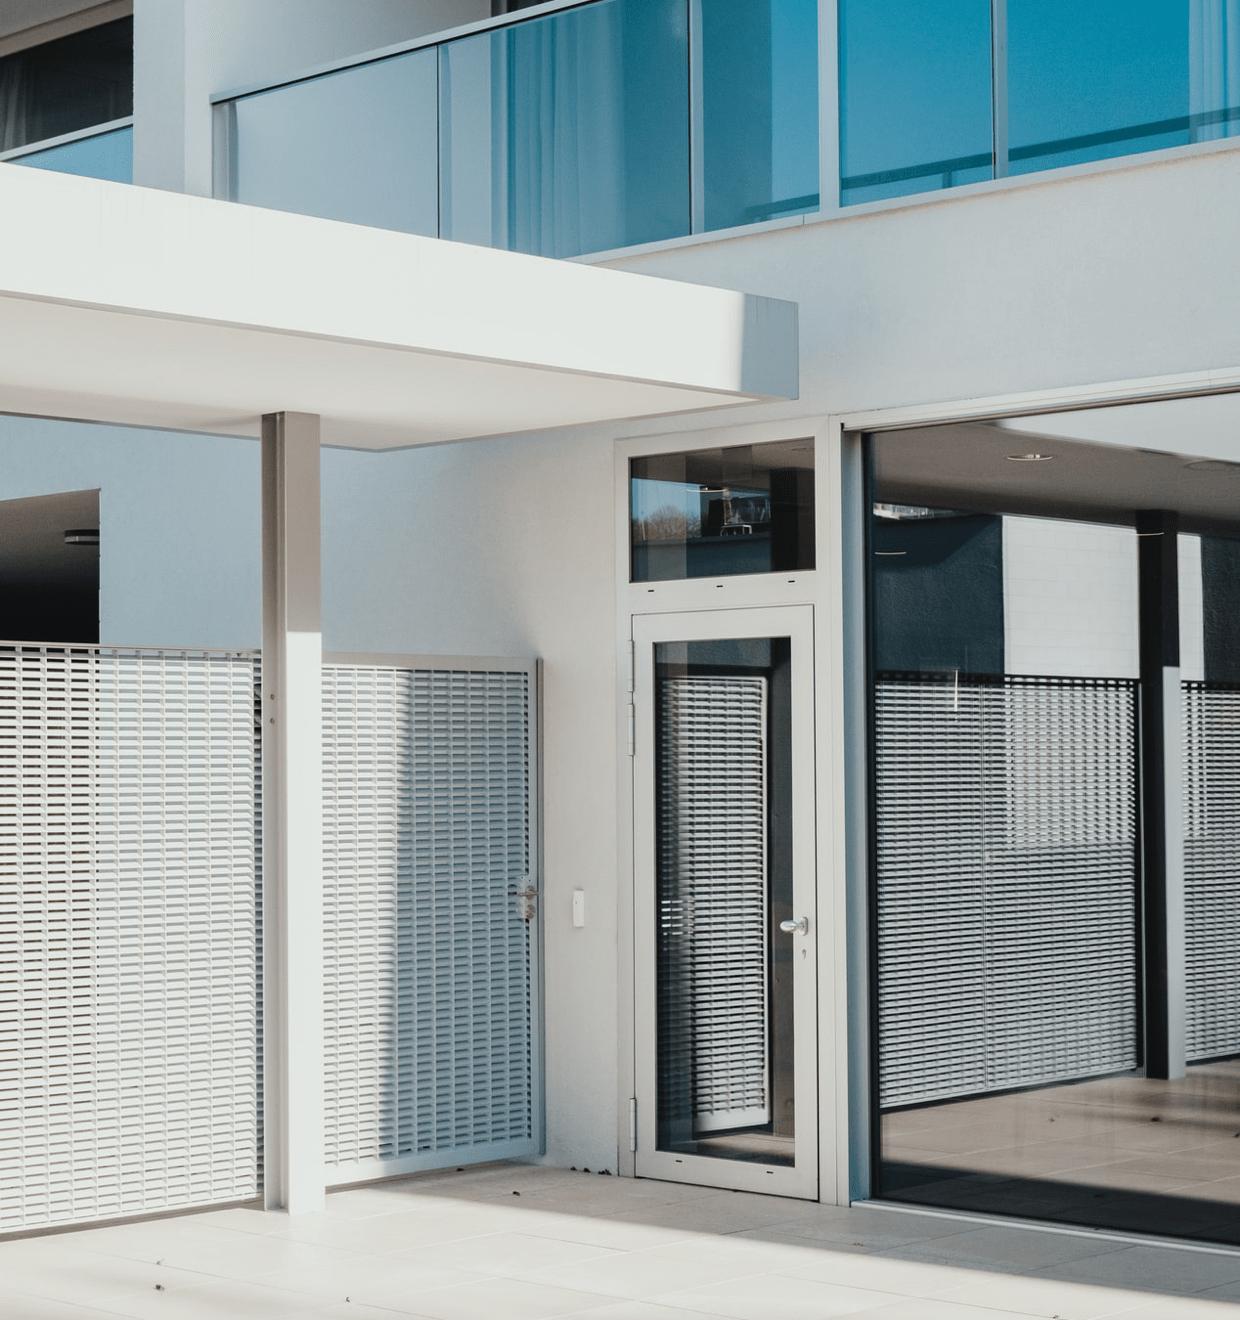 Vivint promo image of a modern building